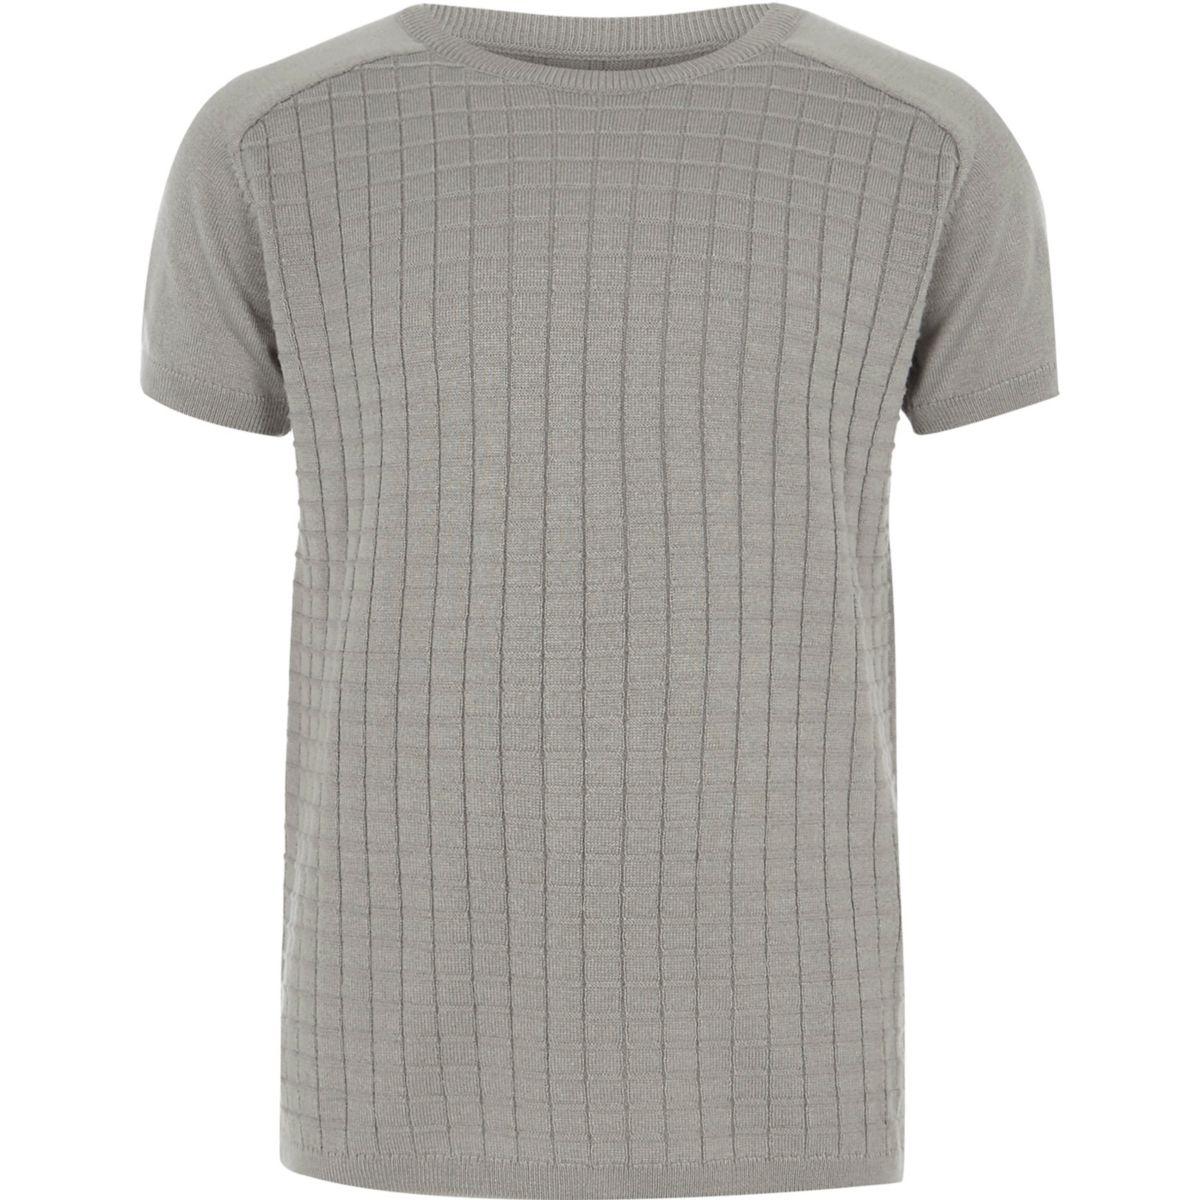 Boys grey knitted grid T-shirt